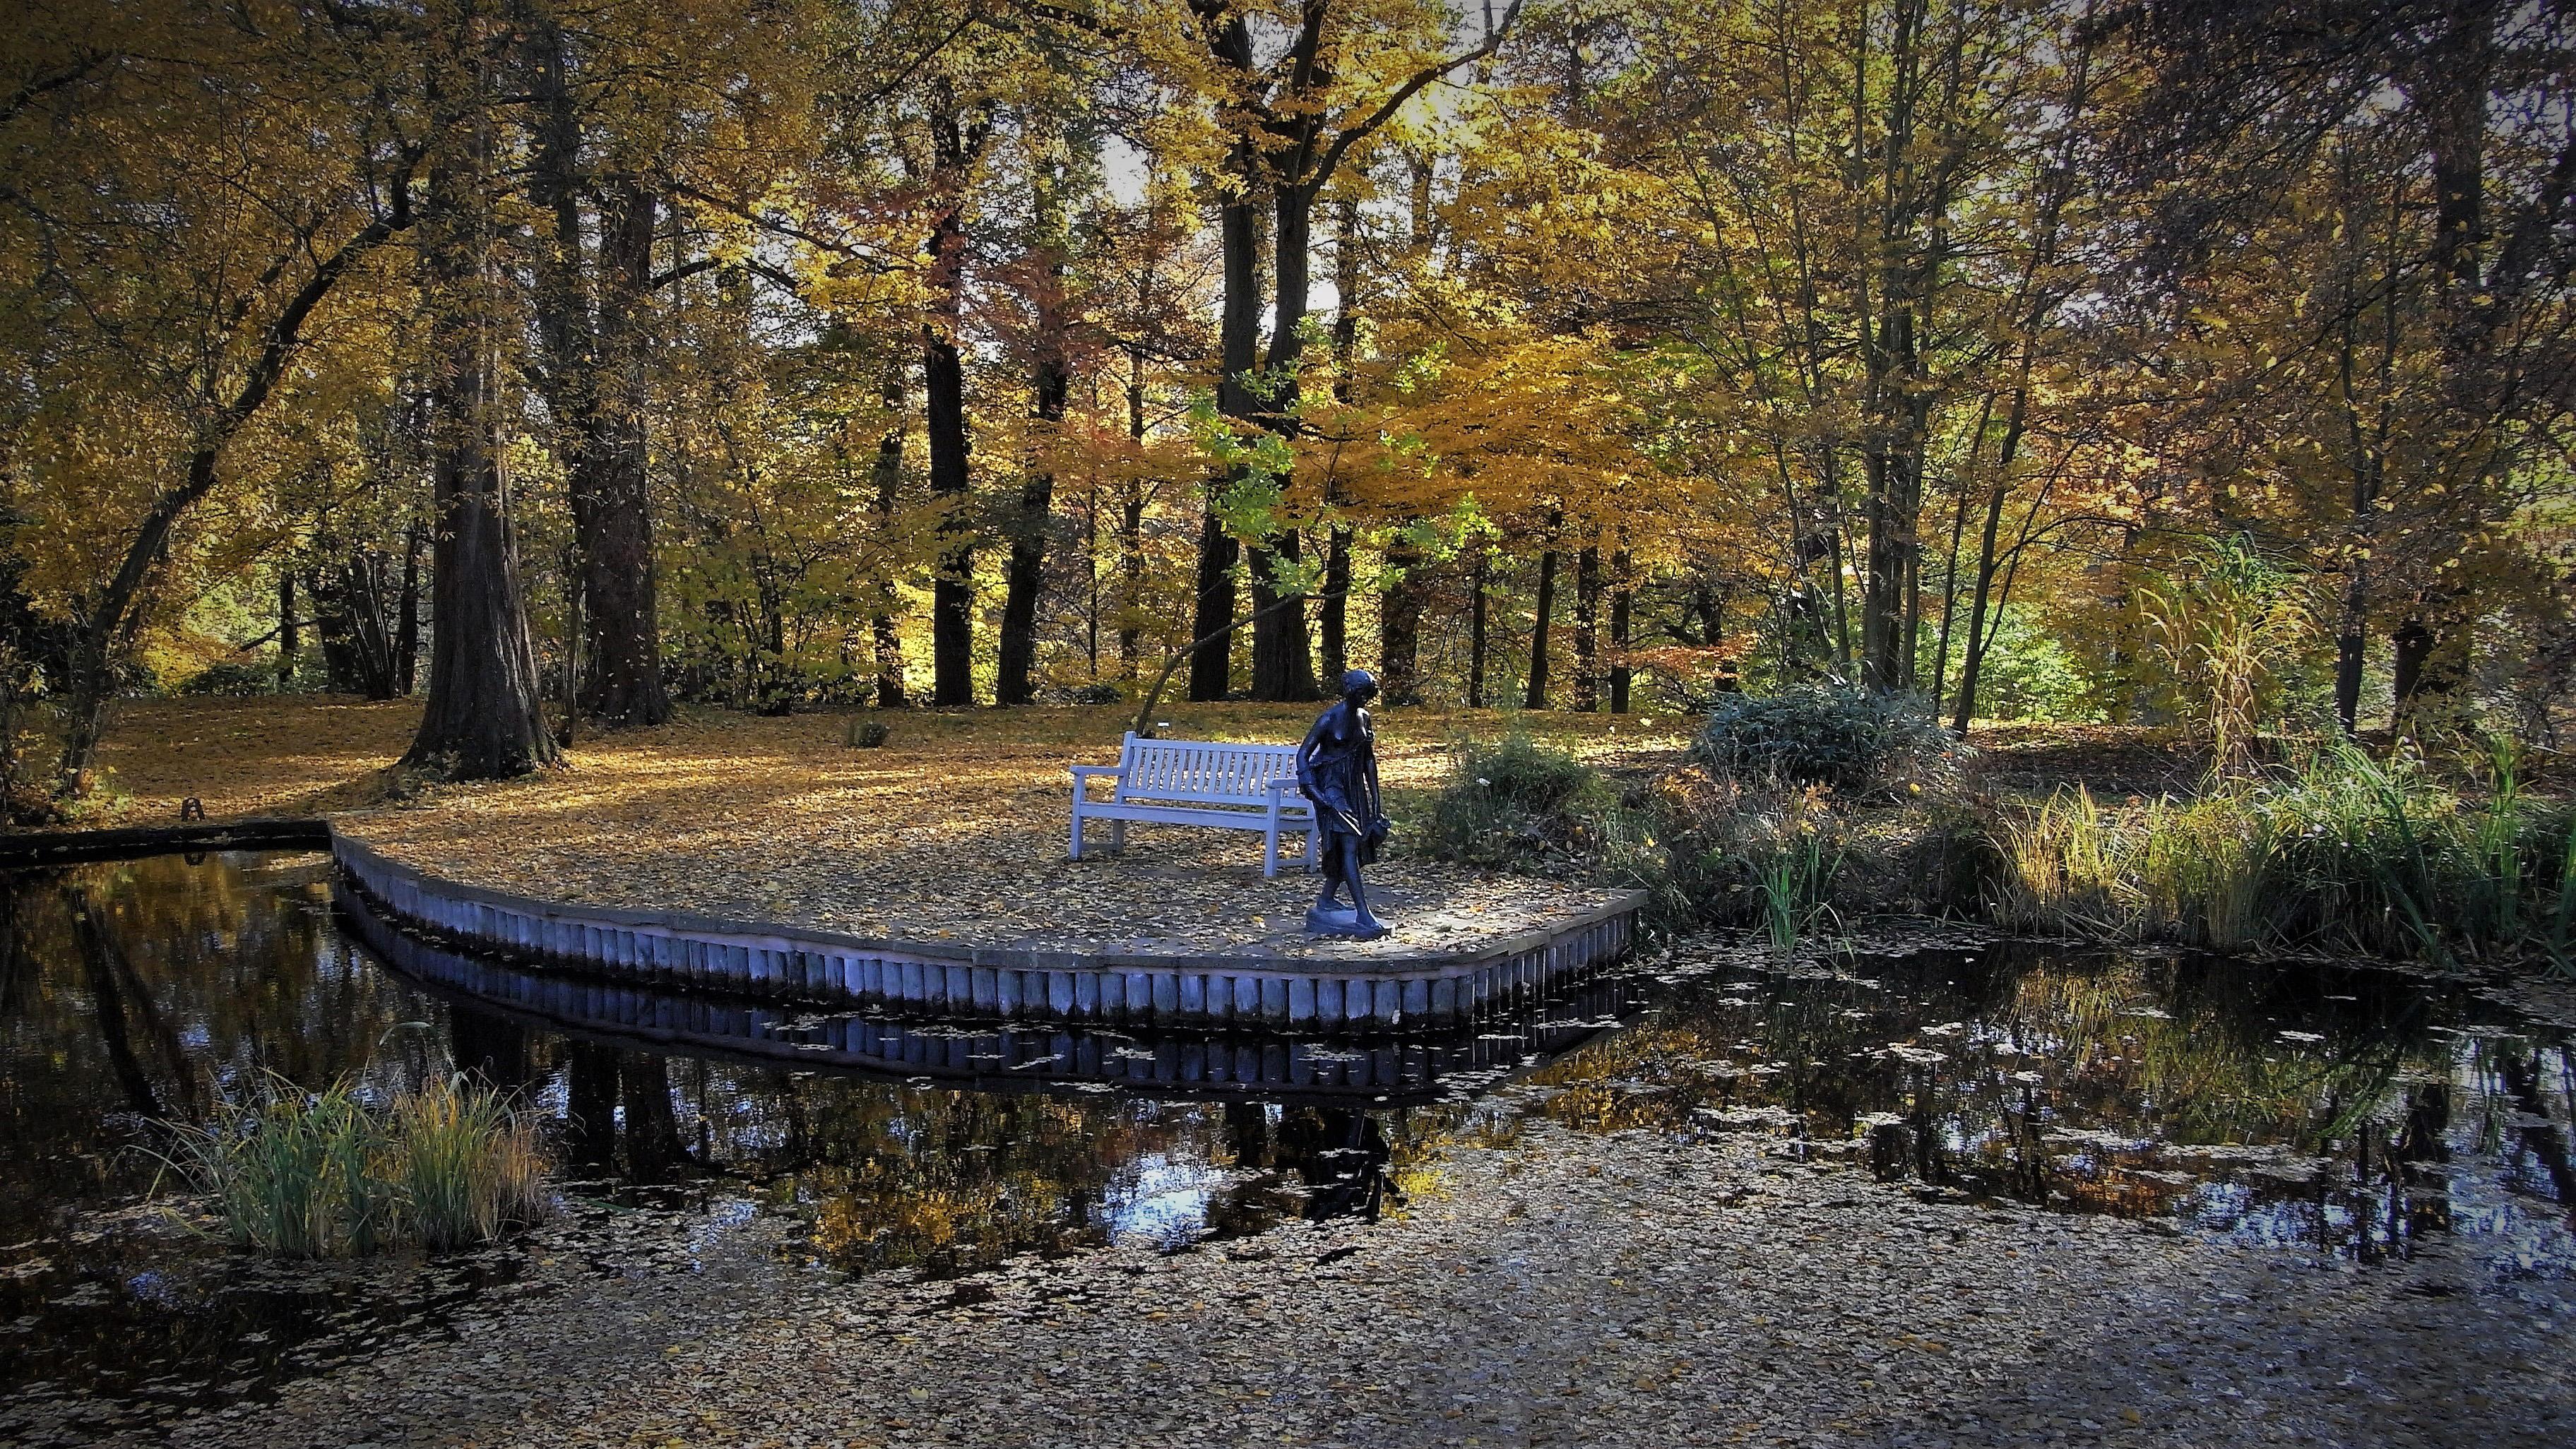 Scene in the Botanical Gardens in Germany image - Free stock photo ...